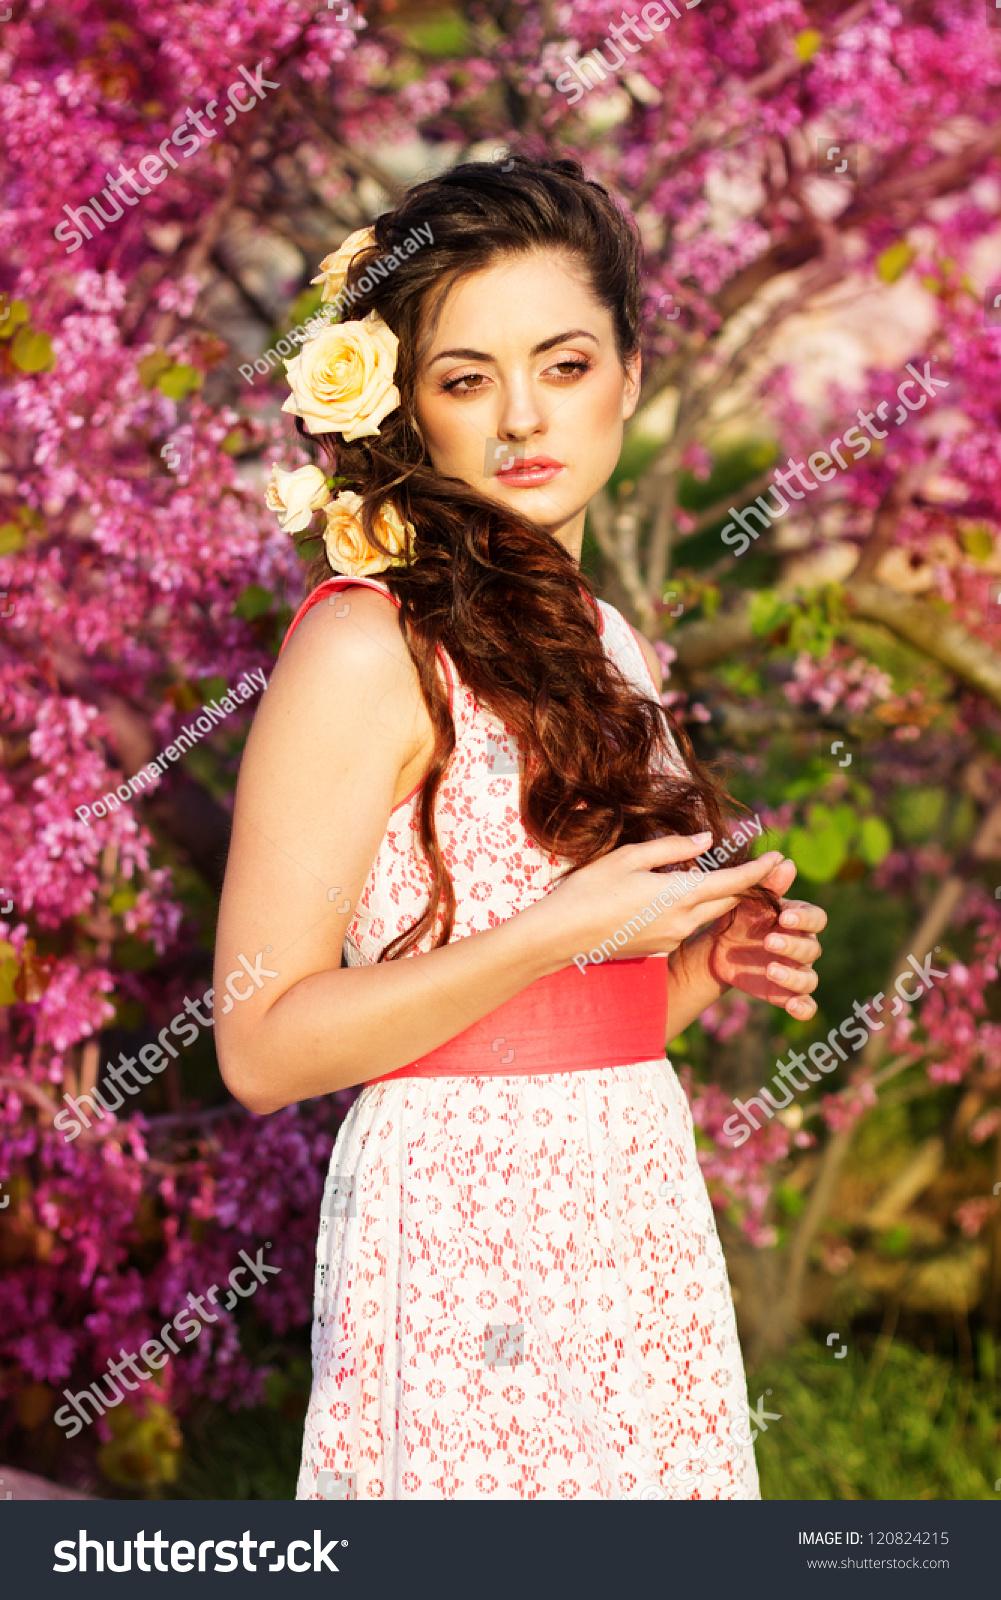 Beautiful woman flowers her hair stock photo edit now 120824215 beautiful woman with flowers in her hair izmirmasajfo